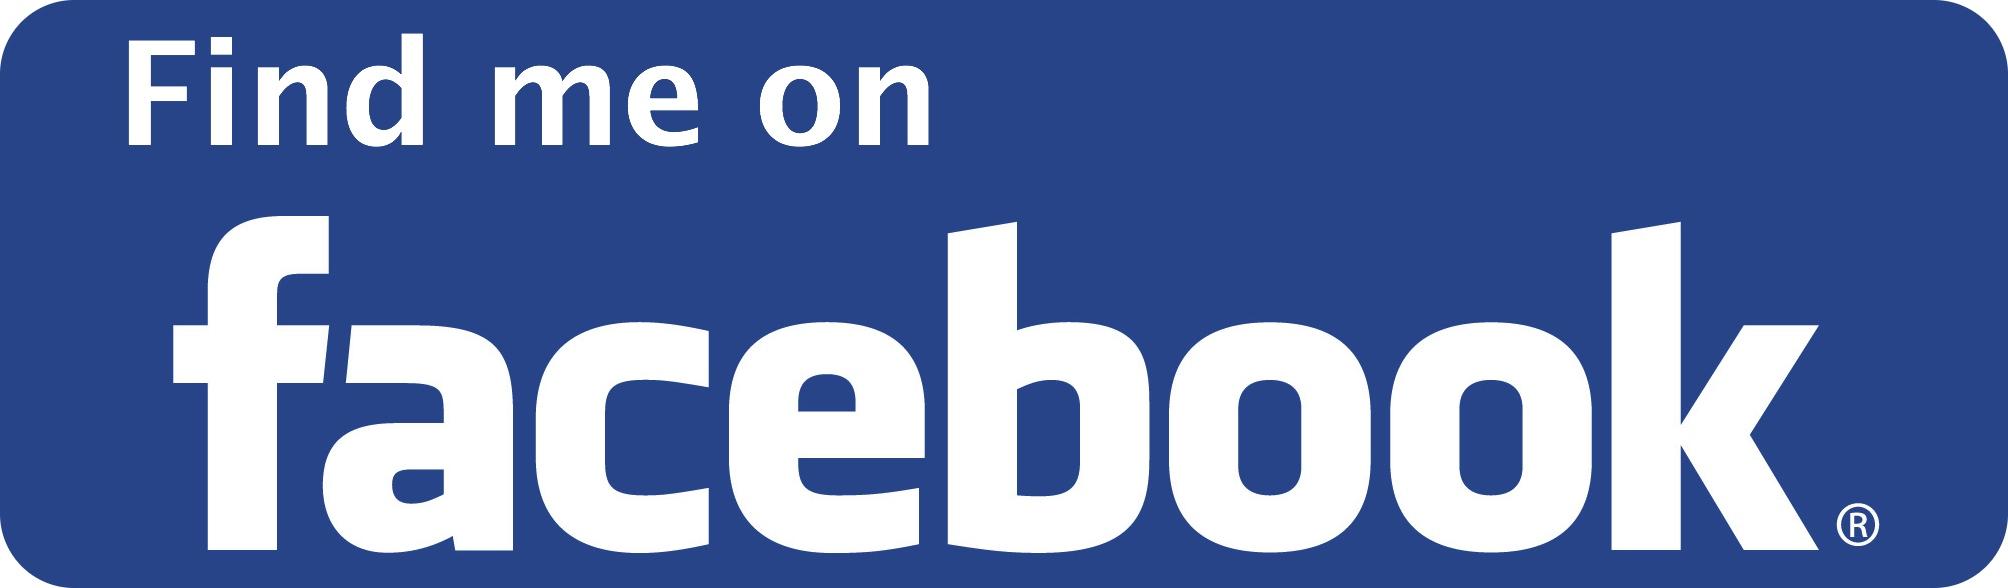 Follow me on Facebook Logo Find me on Facebook